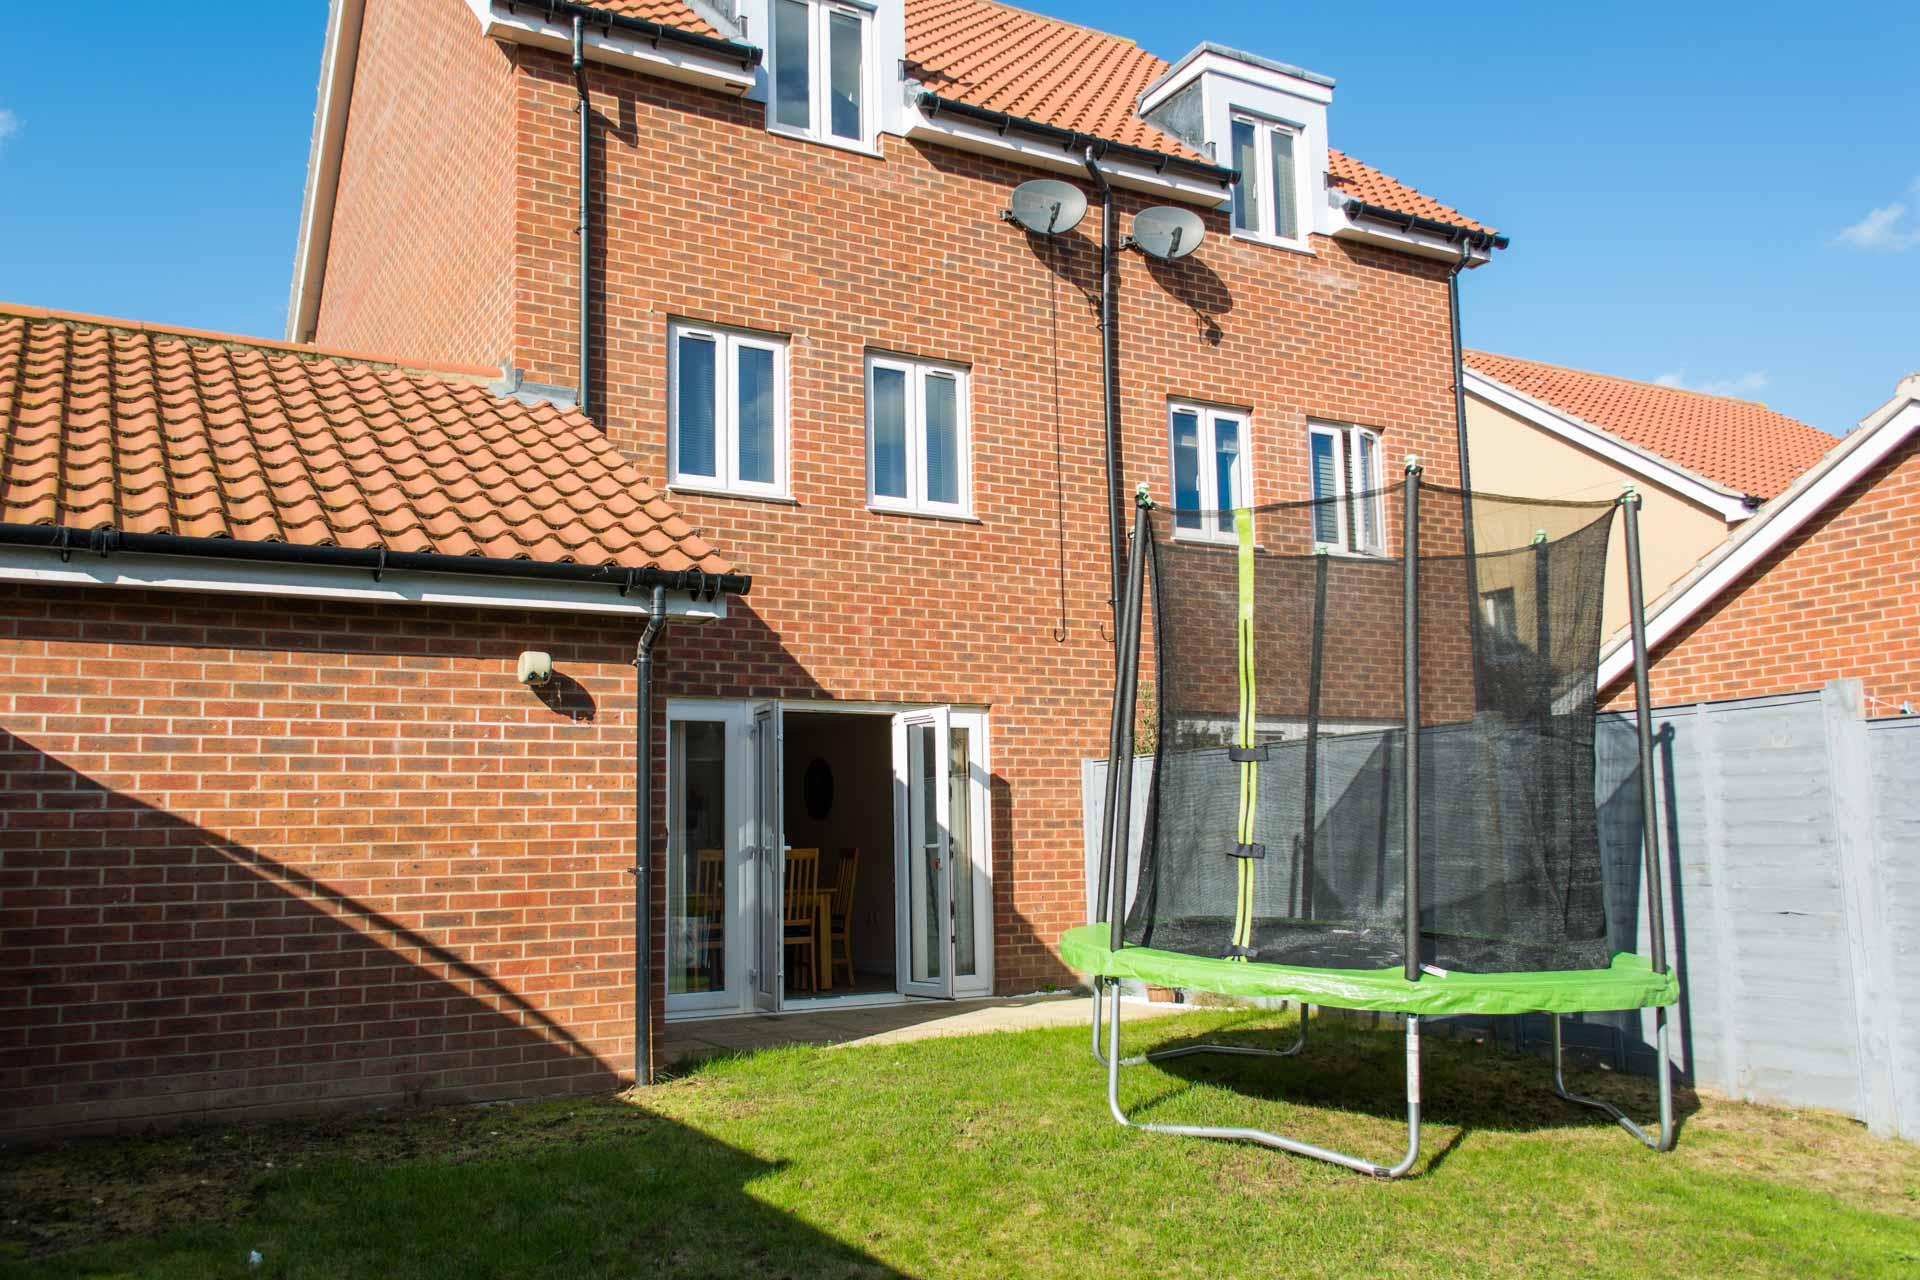 Norwich holiday rental garden with trampoline.